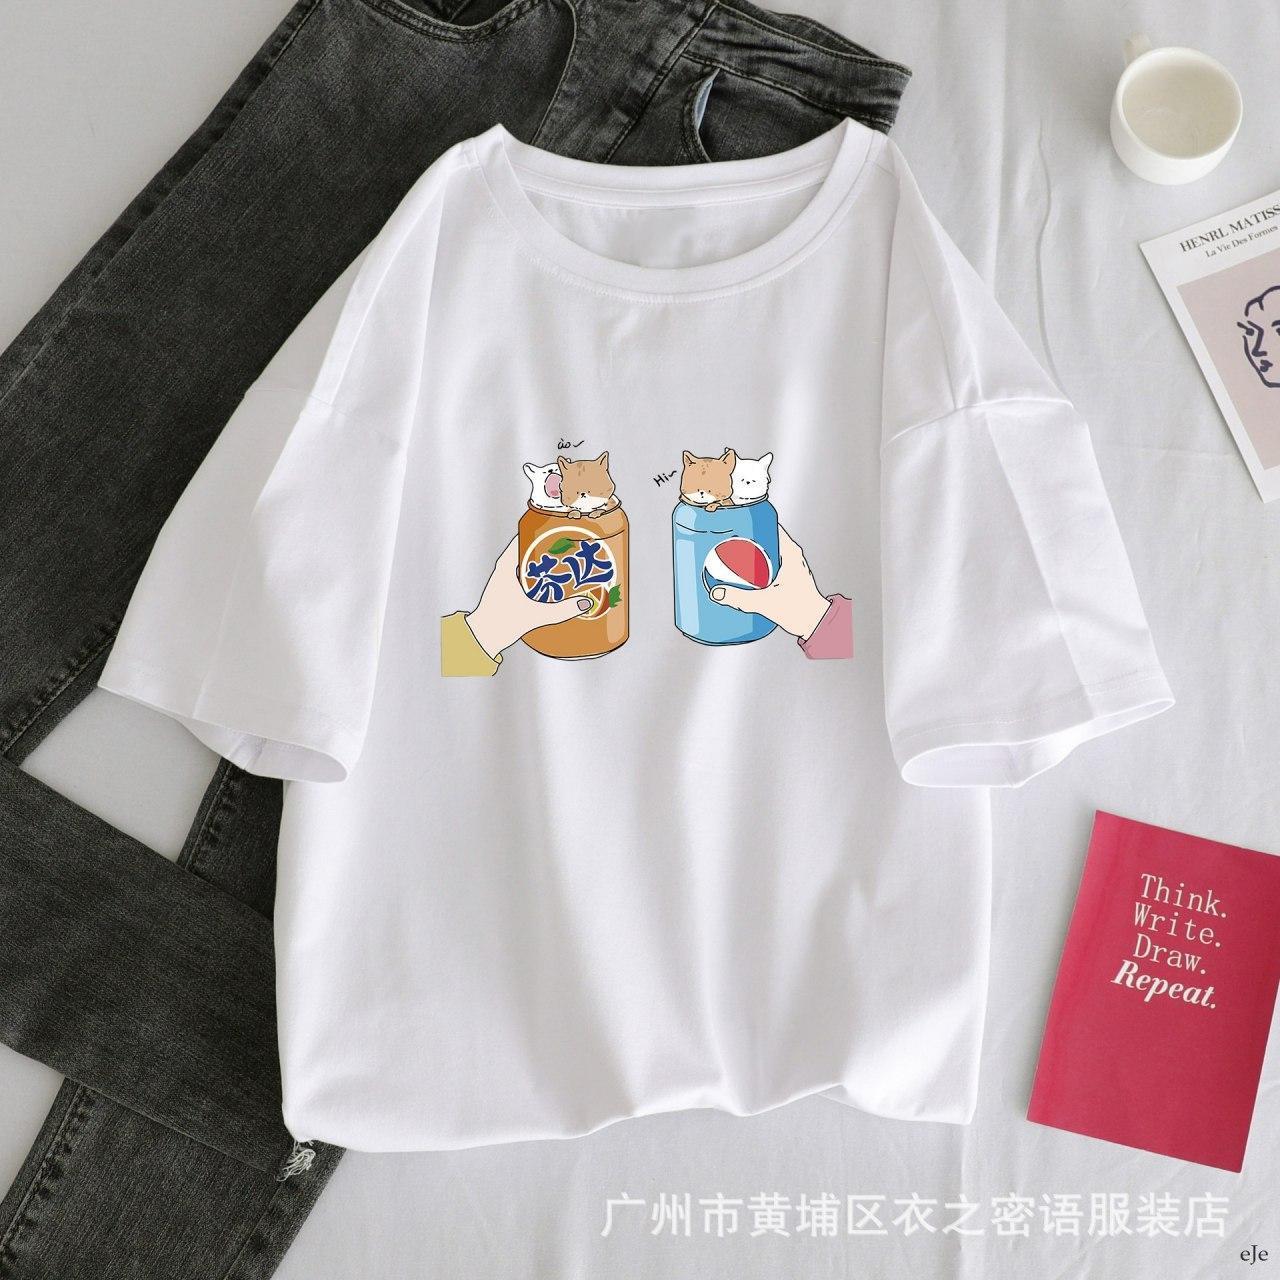 Женская белая футболка с рисунком пепси и фанта vN8056